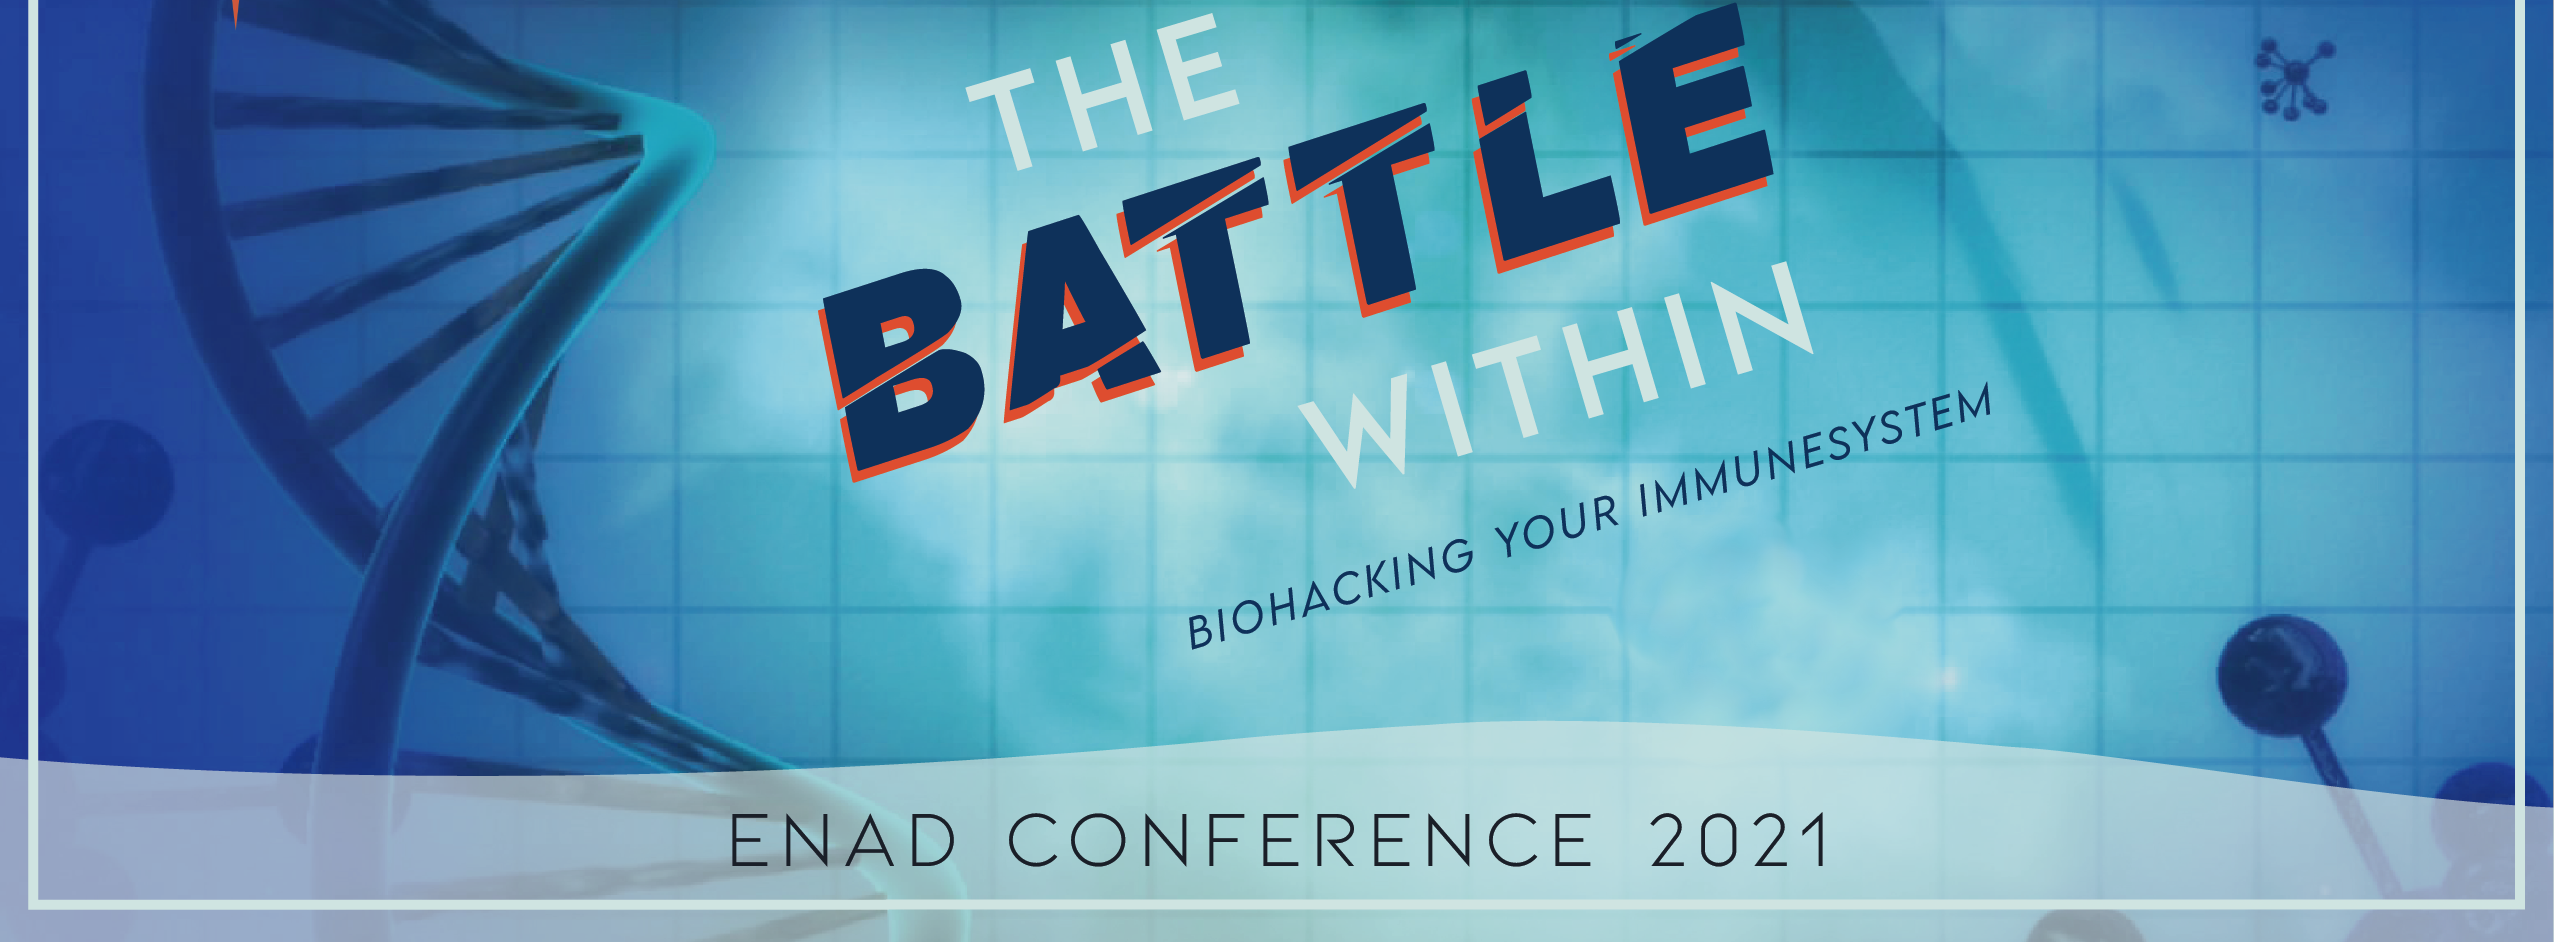 ENAD Online Conference 2021